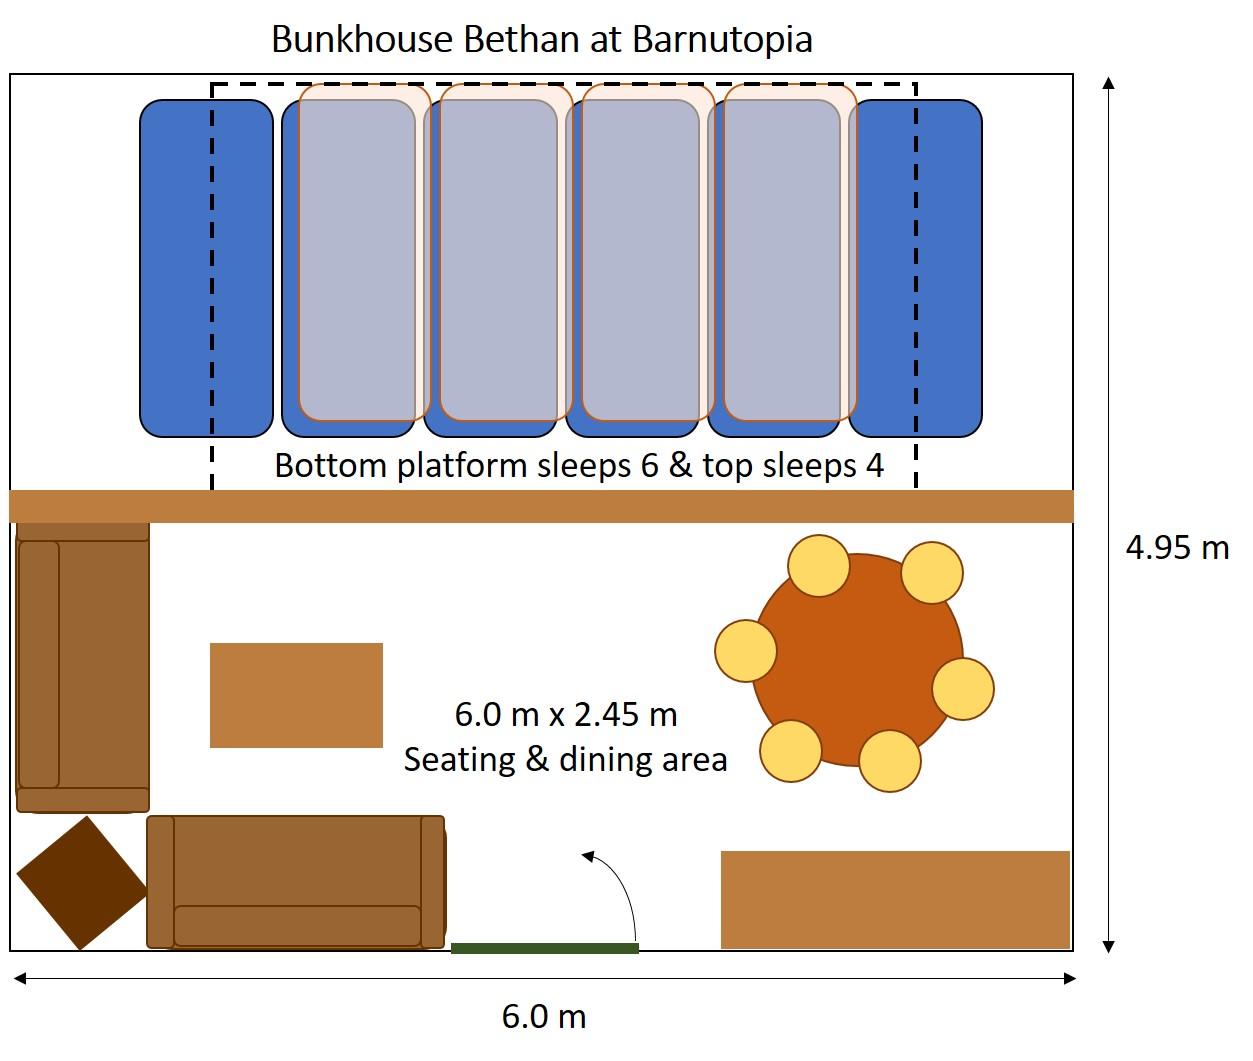 plan drawing of bunkhouse bethan